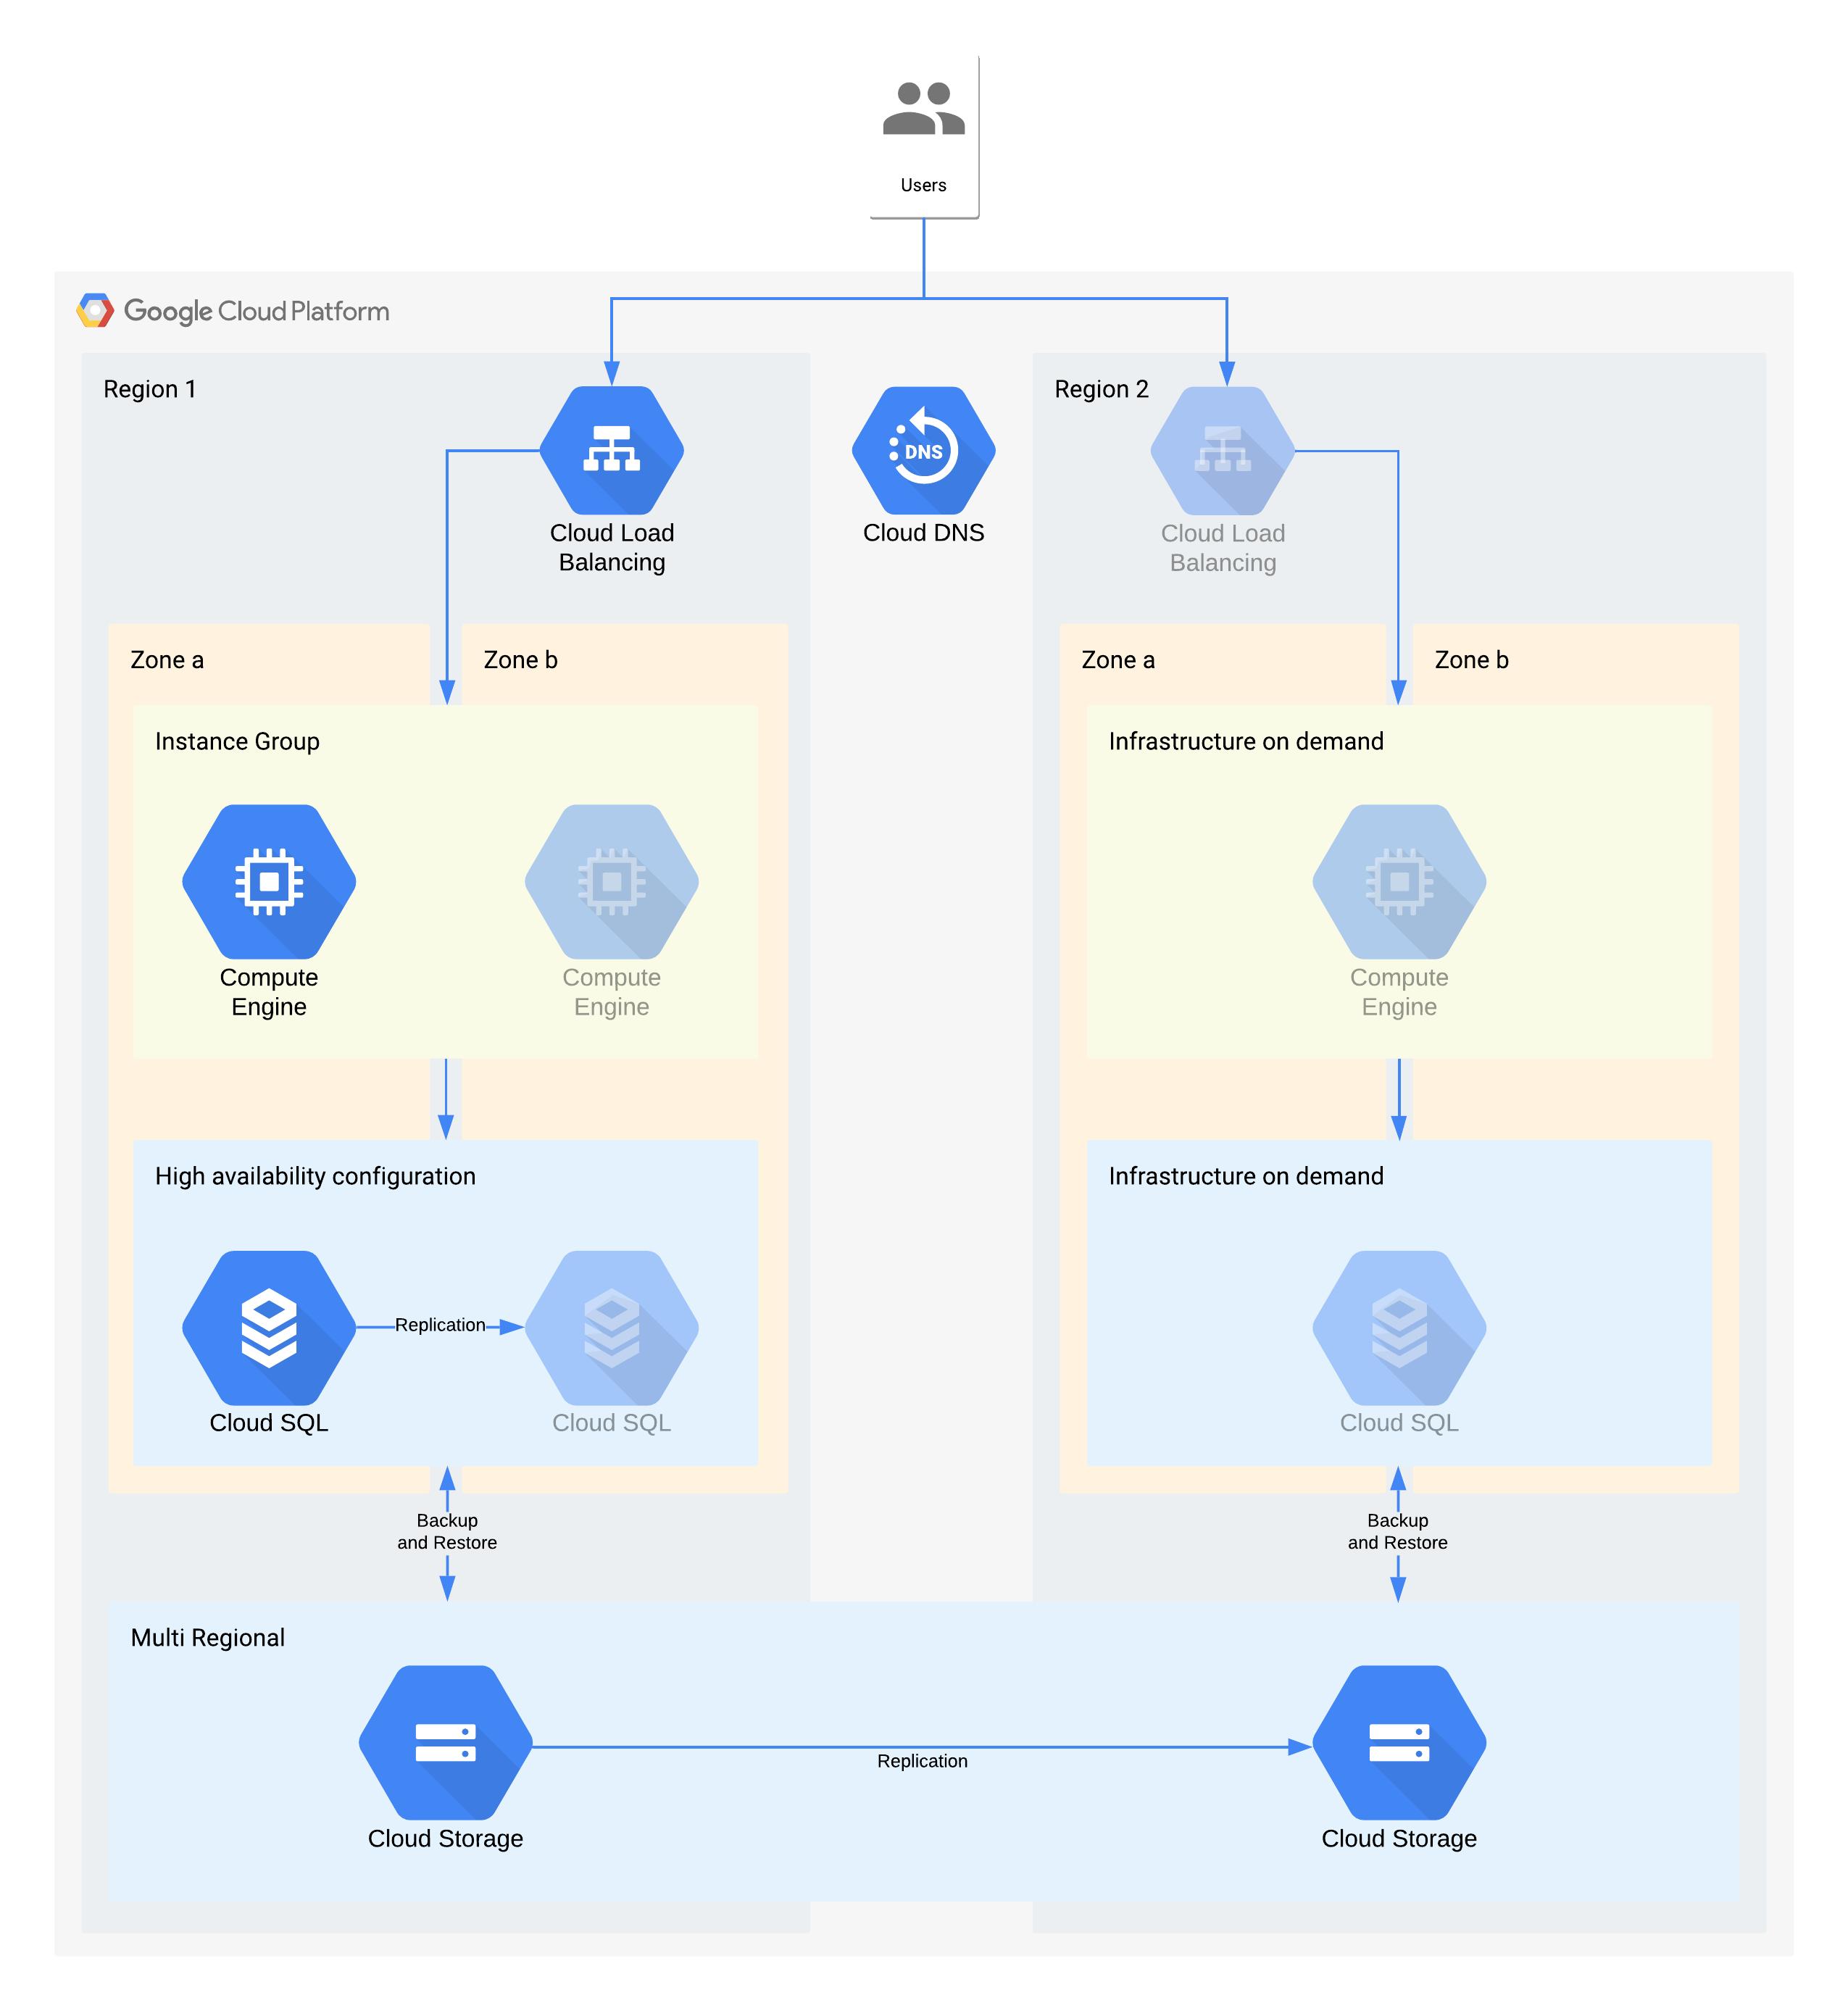 Google Cloud 제품을 사용하는 등급 3 아키텍처 예시